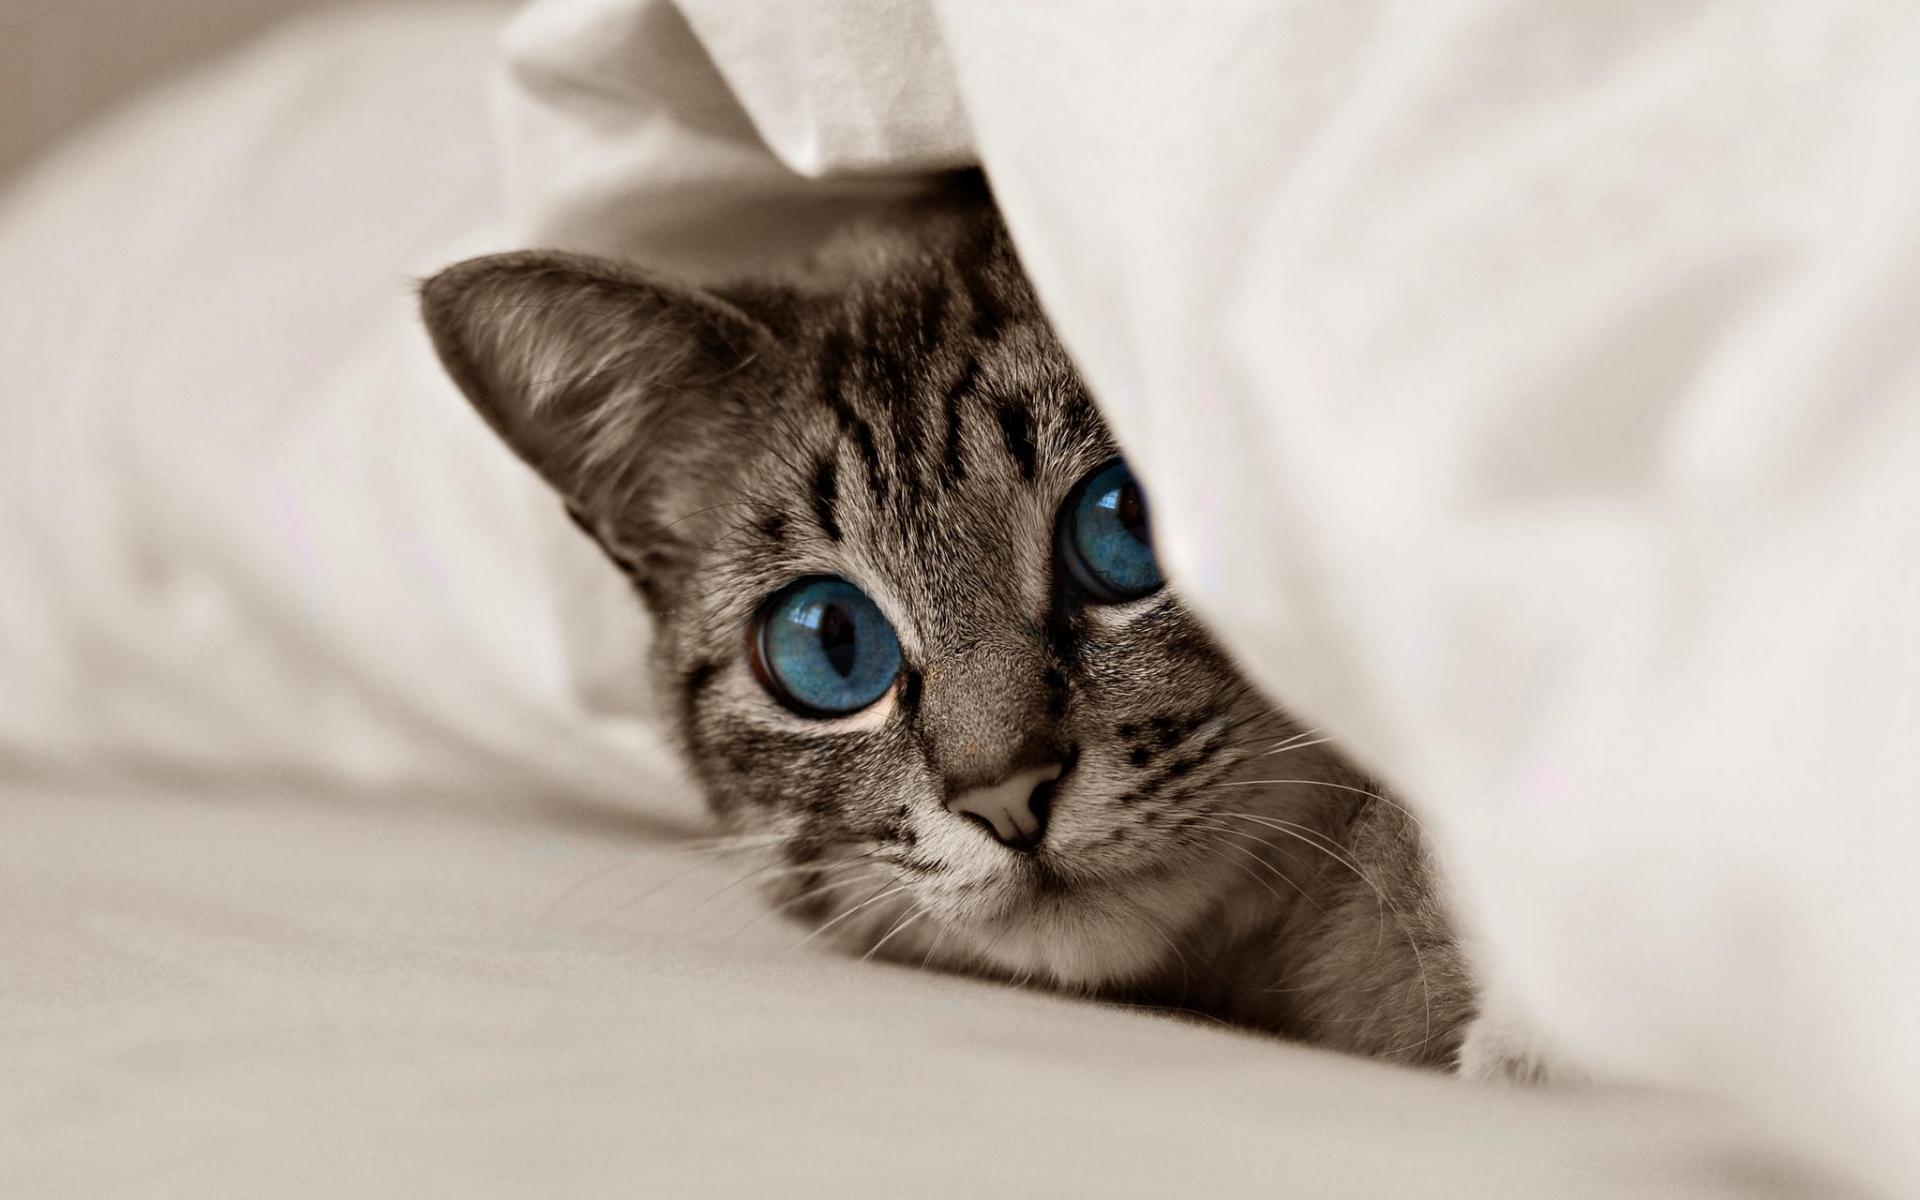 Кошки обои и картинки на рабочий лайнере